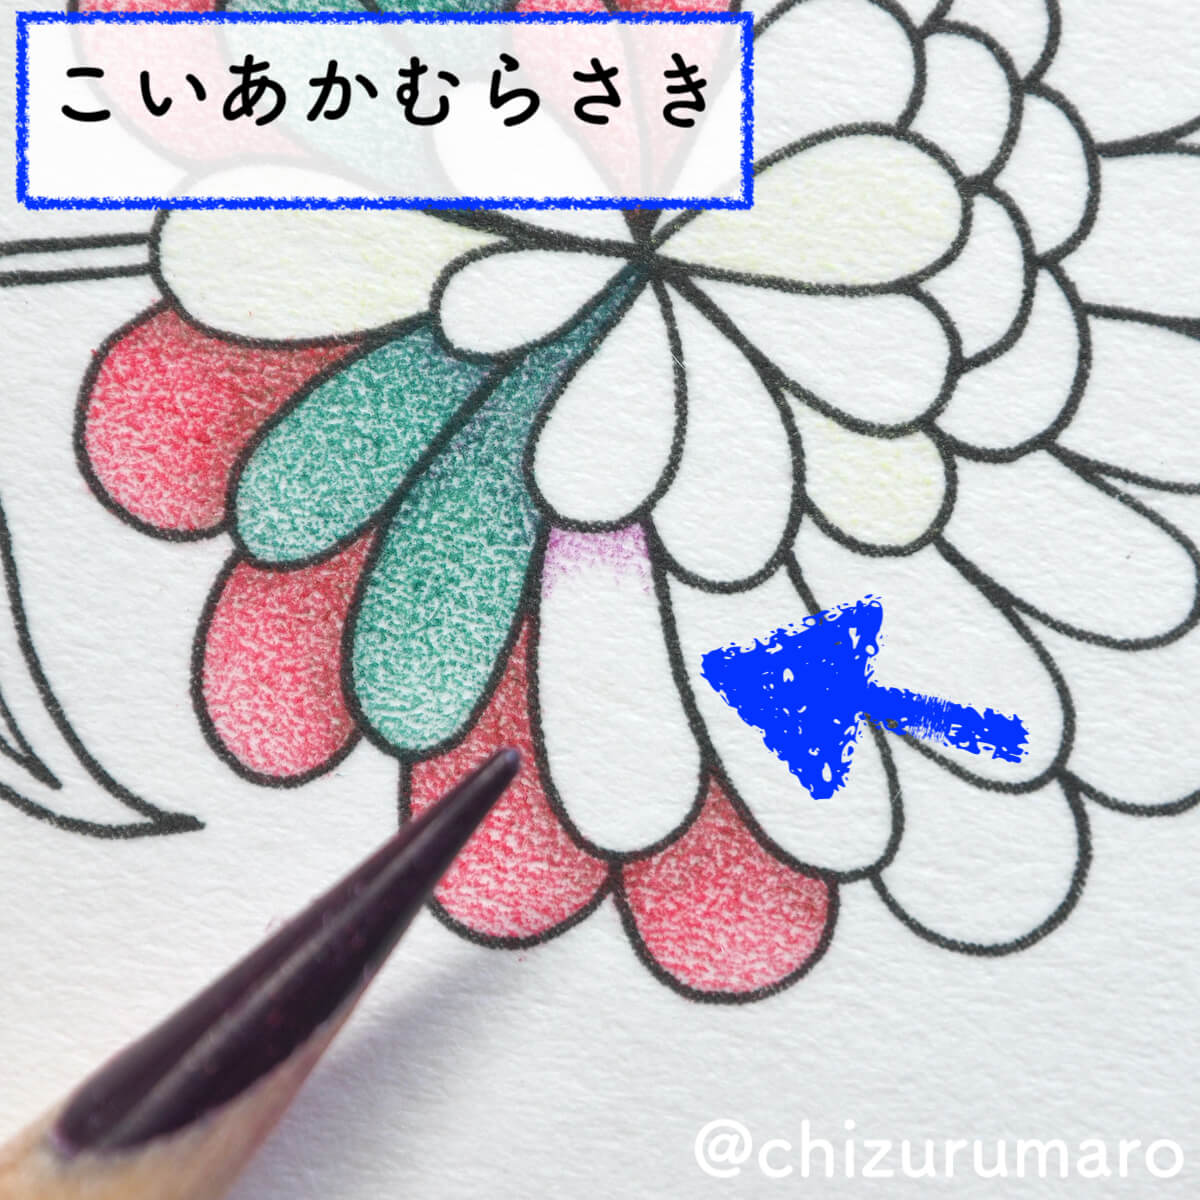 f:id:chizurumaro:20200511124940j:plain